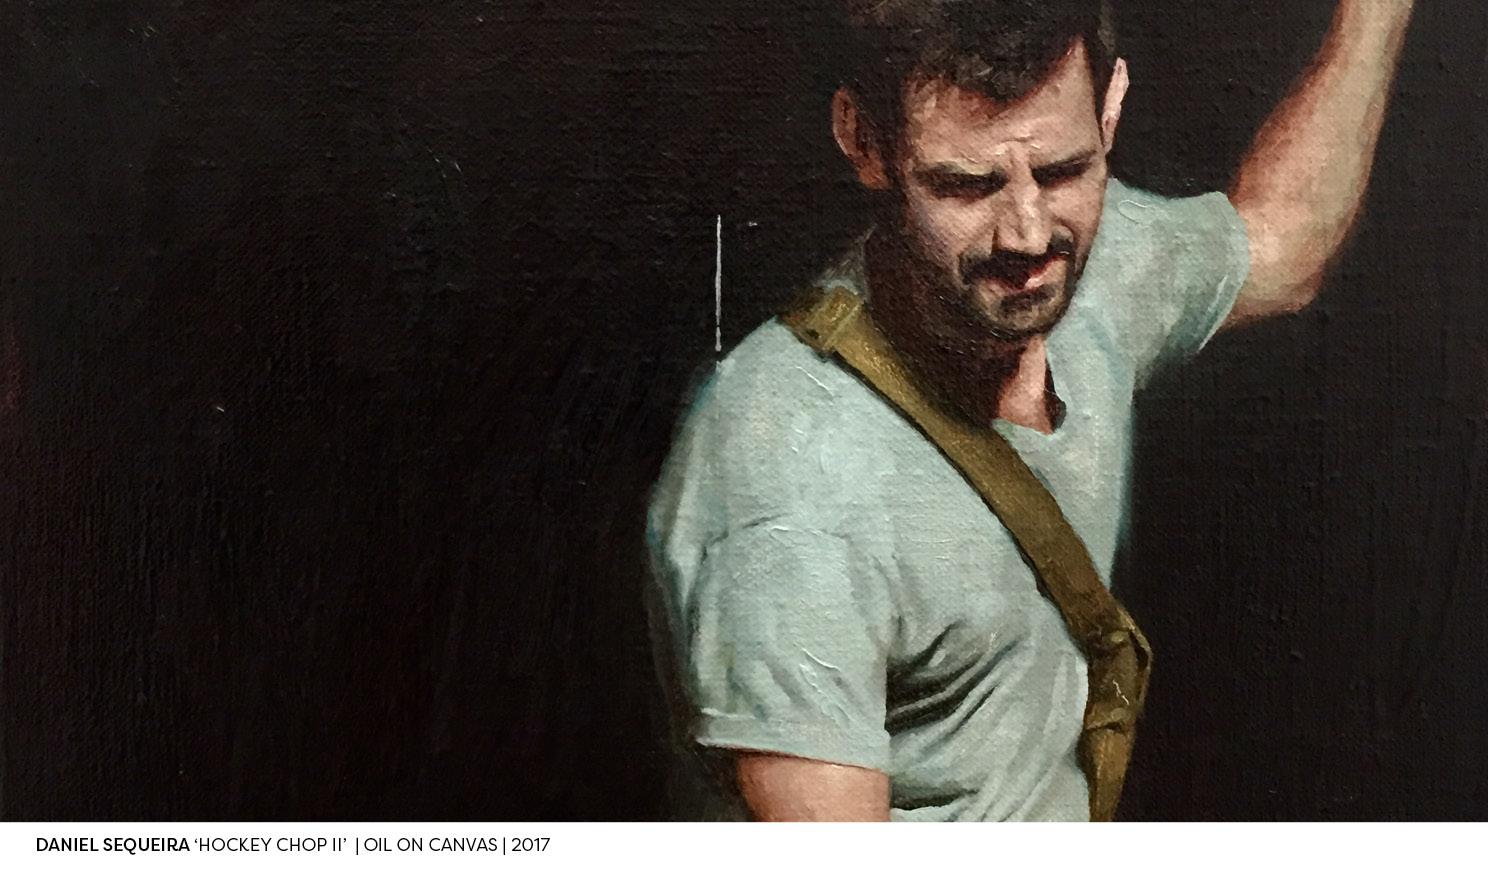 daniel sequeira portrait artist